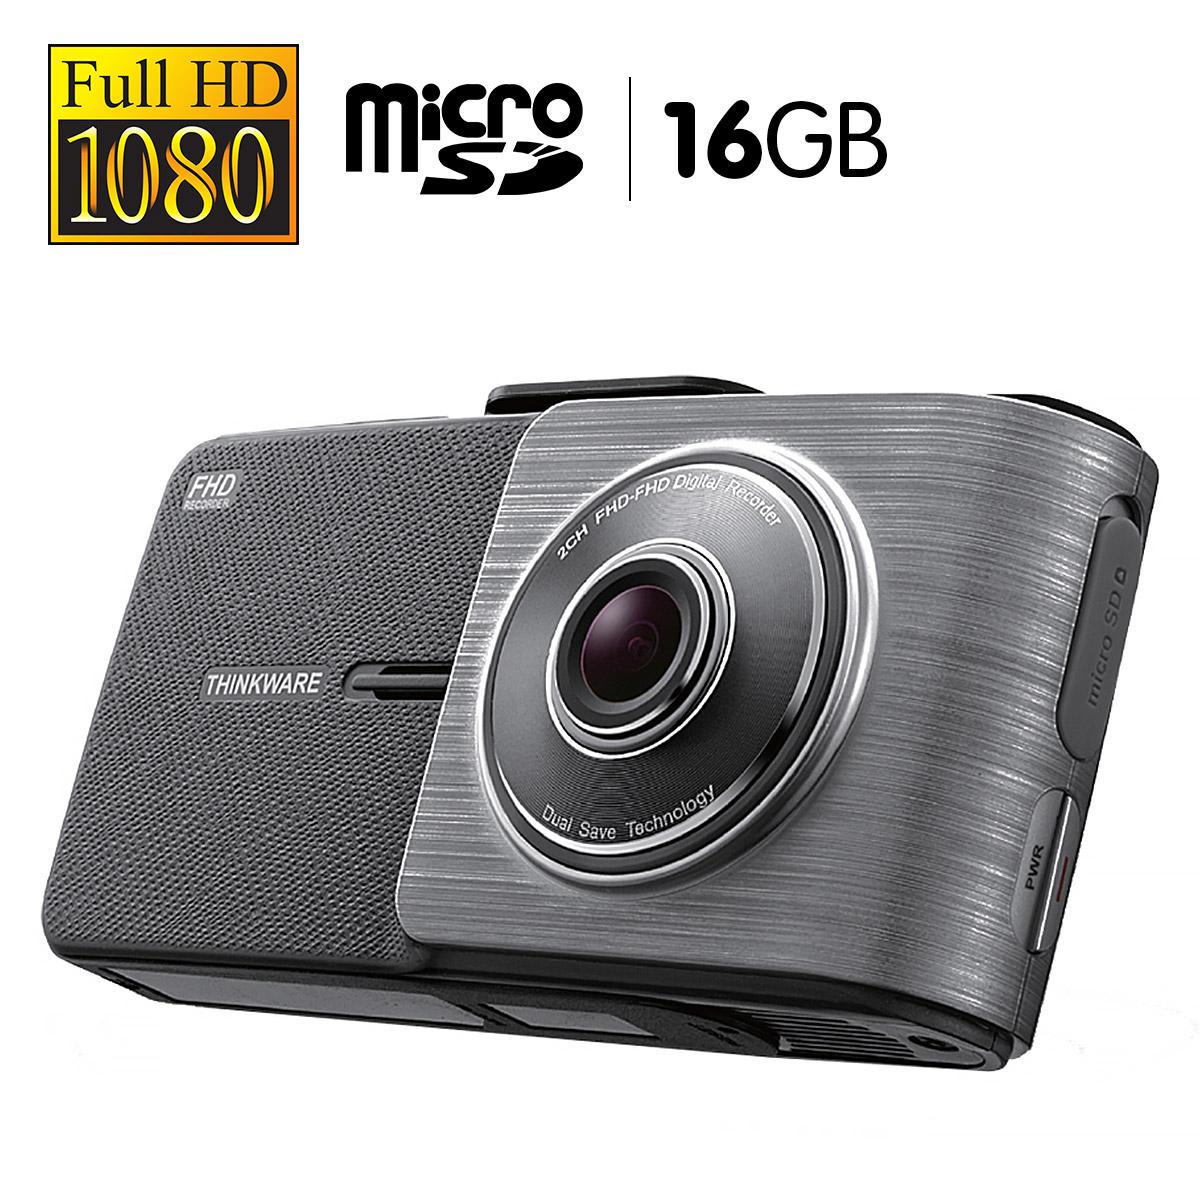 THINKWARE 1080P Full HD Dash Cam With 16GB Micro SD - X55016